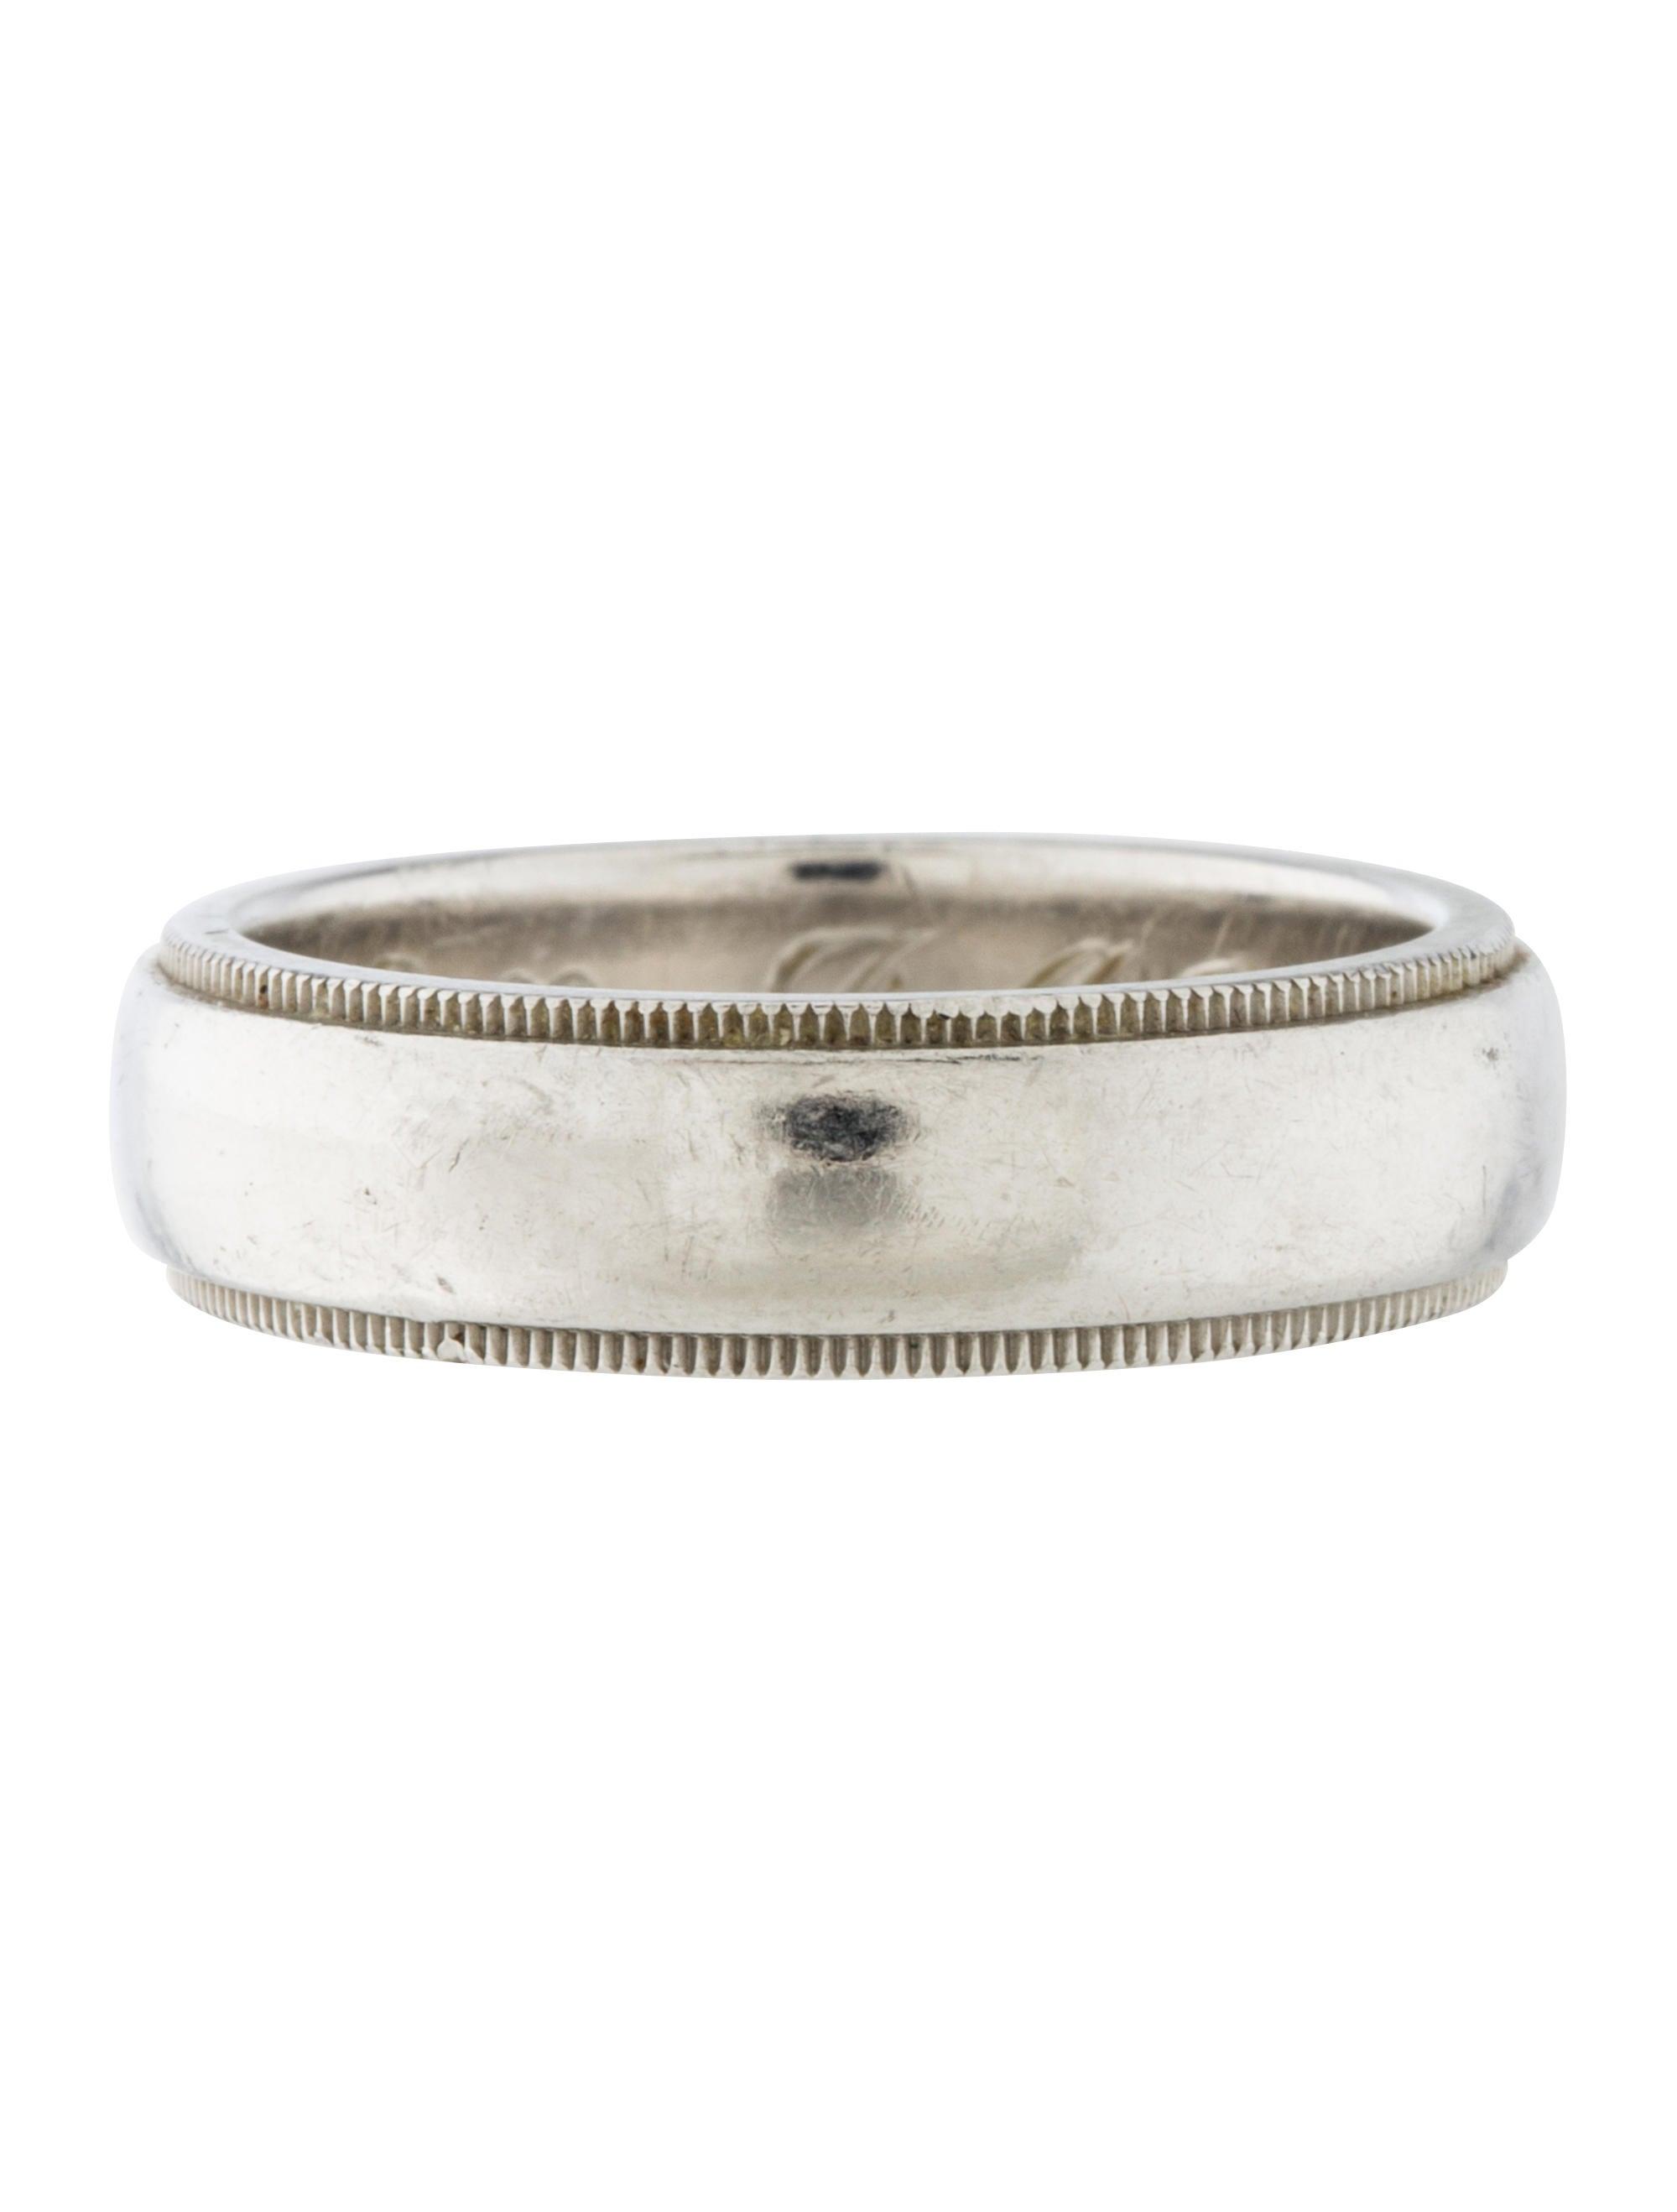 051ccc370 Tiffany & Co. Classic Milgrain Wedding Band Ring - Rings - TIF50725 ...